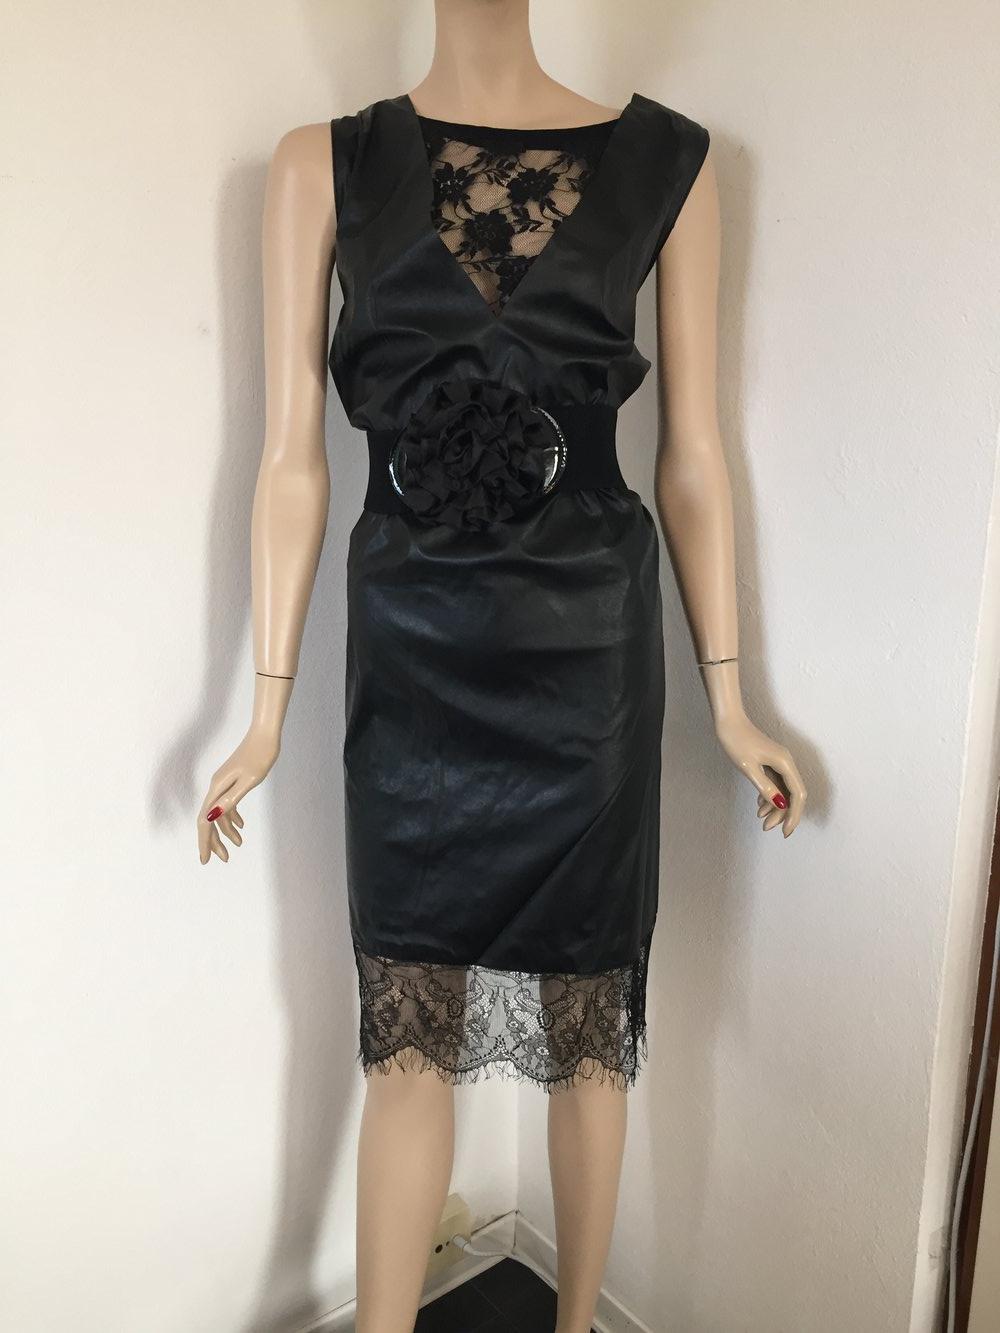 Sexy Lederkleid Abendkleid Cocktailkleid :: Kleiderkorb.de